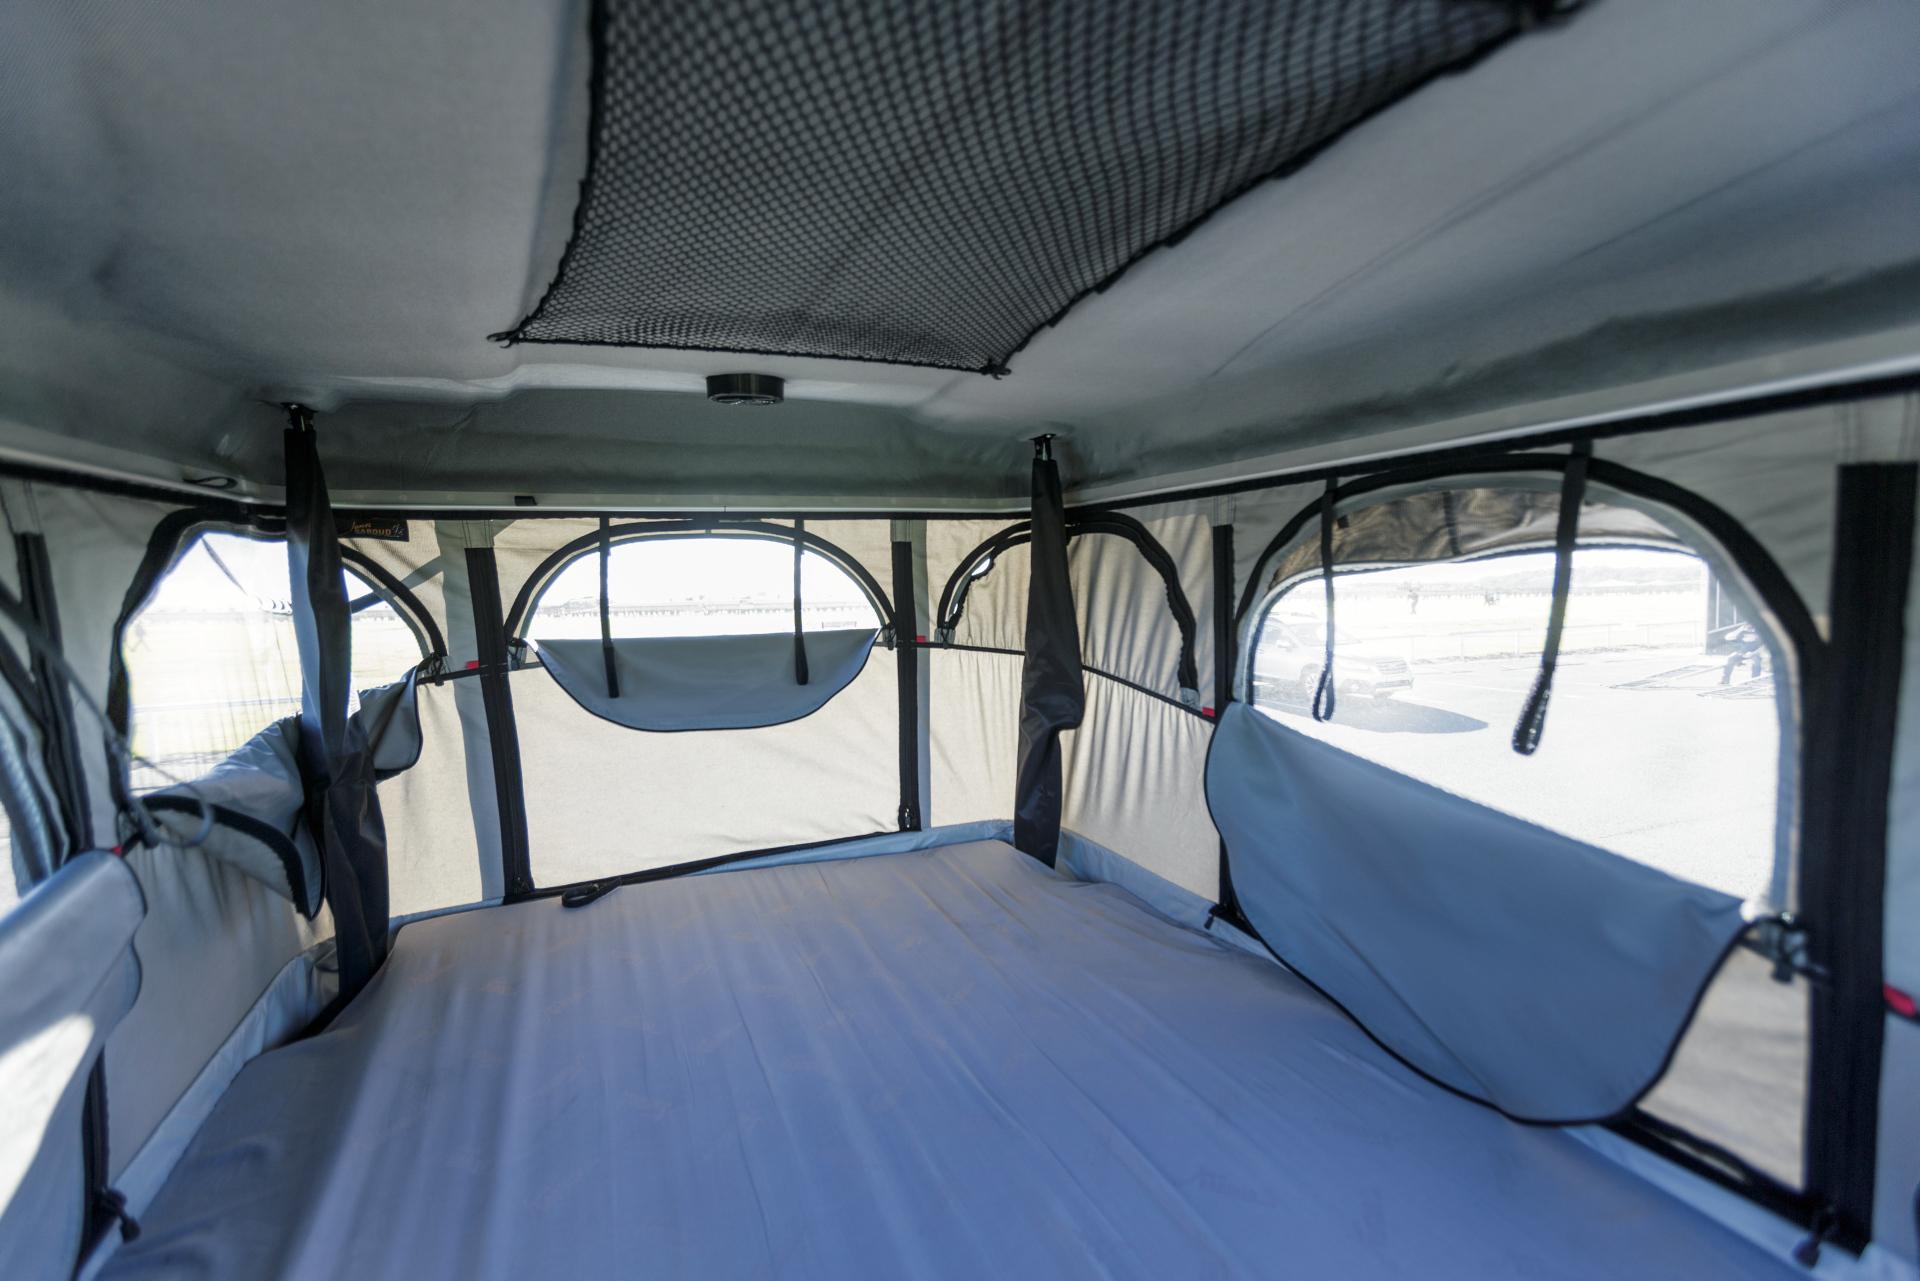 apollo vivid camper wohnmobil mieten in australien. Black Bedroom Furniture Sets. Home Design Ideas